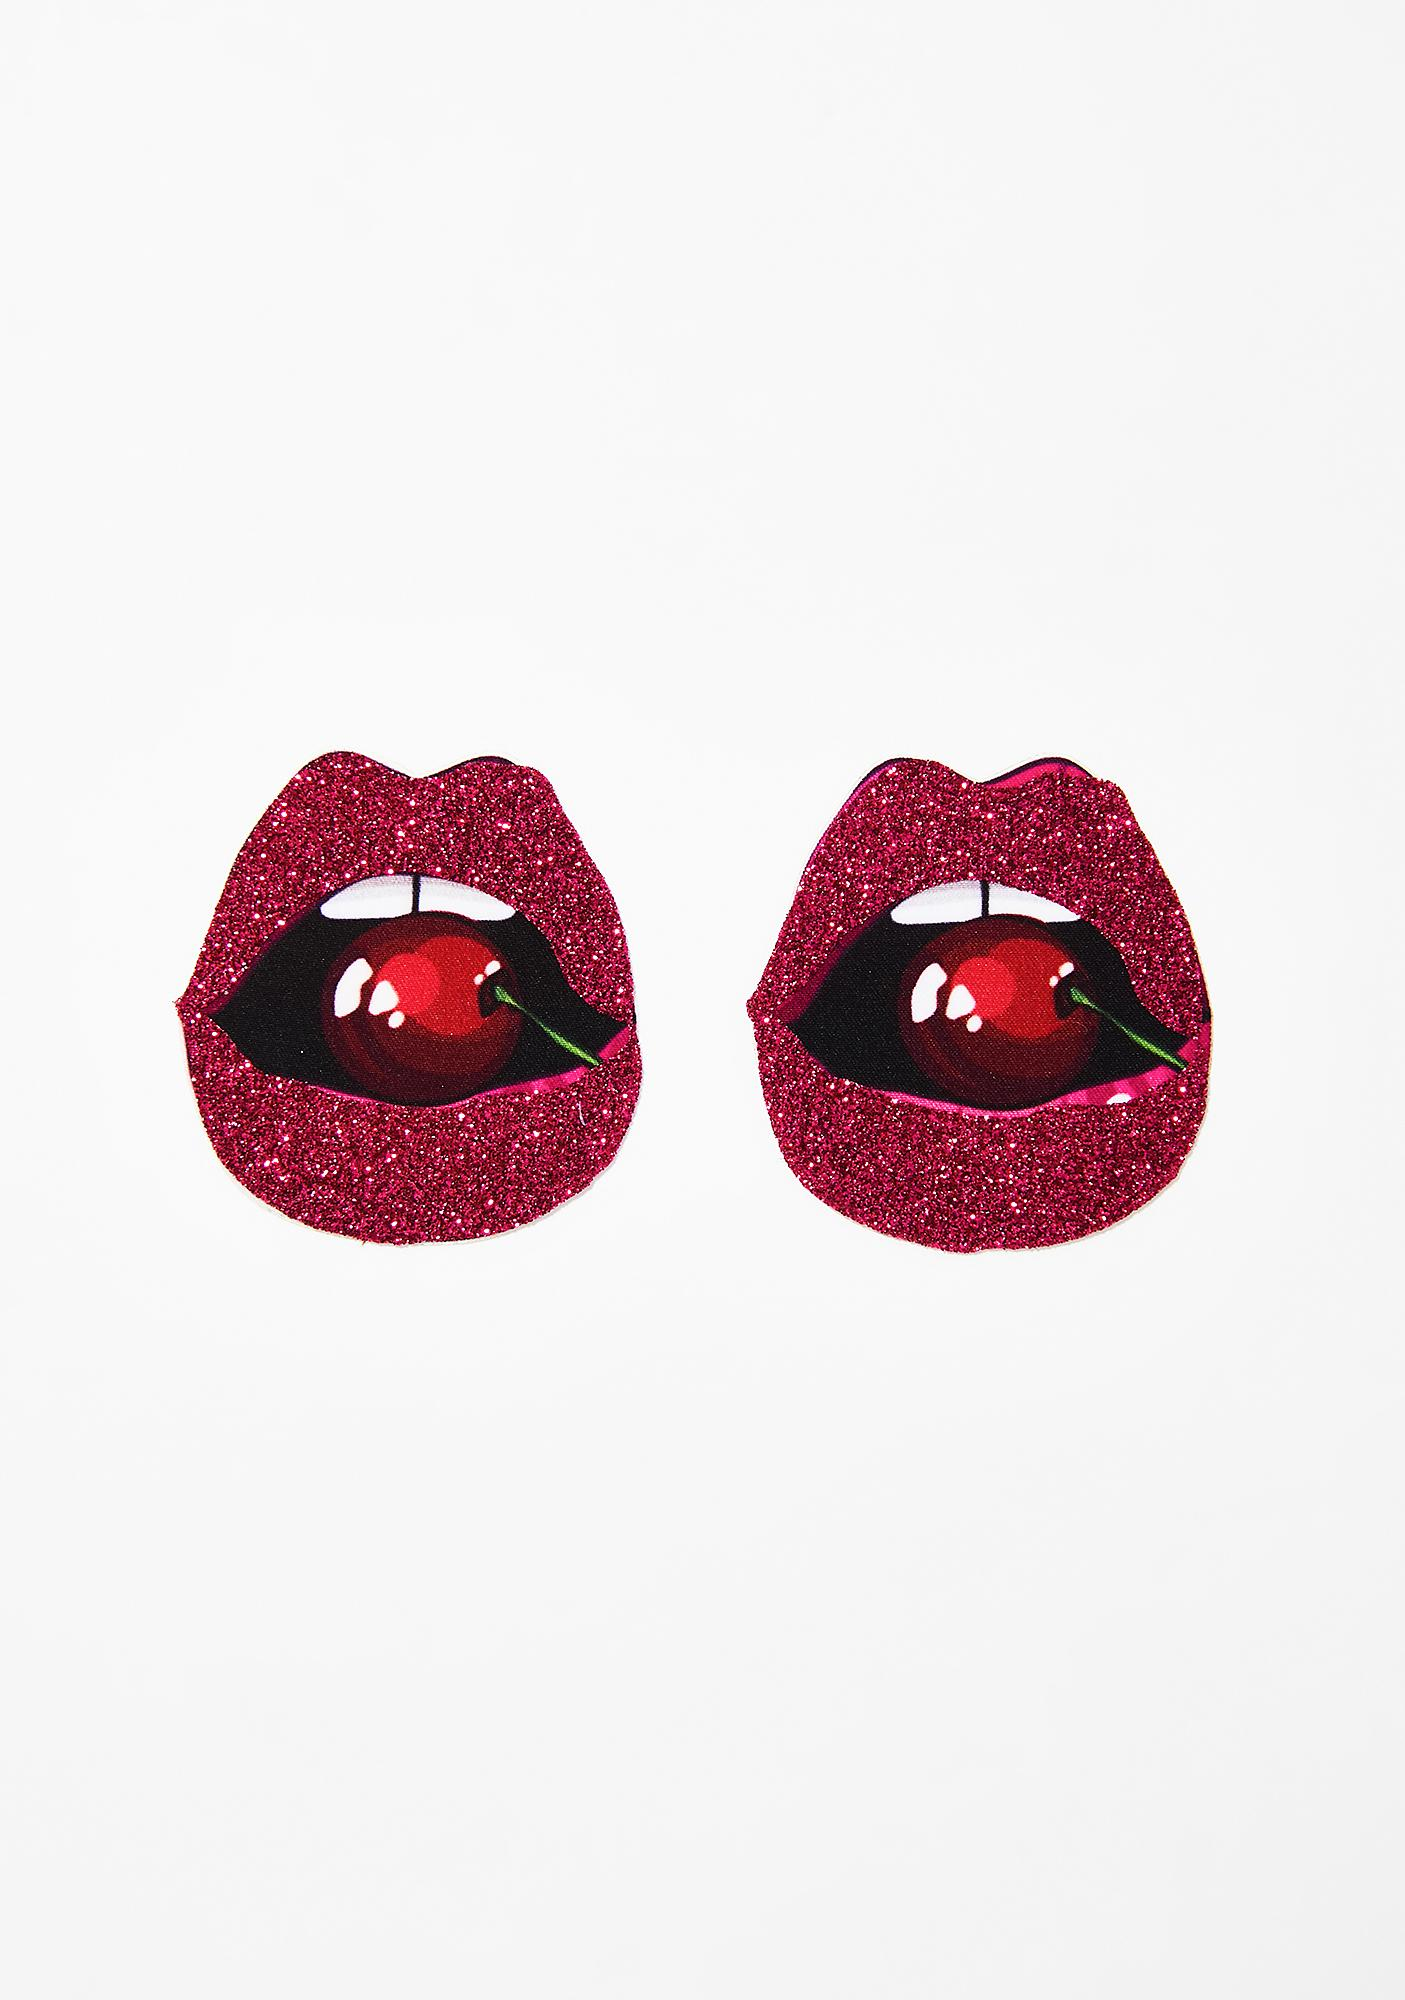 Neva Nude Cherry Poppin' Glitter Lip Pasties